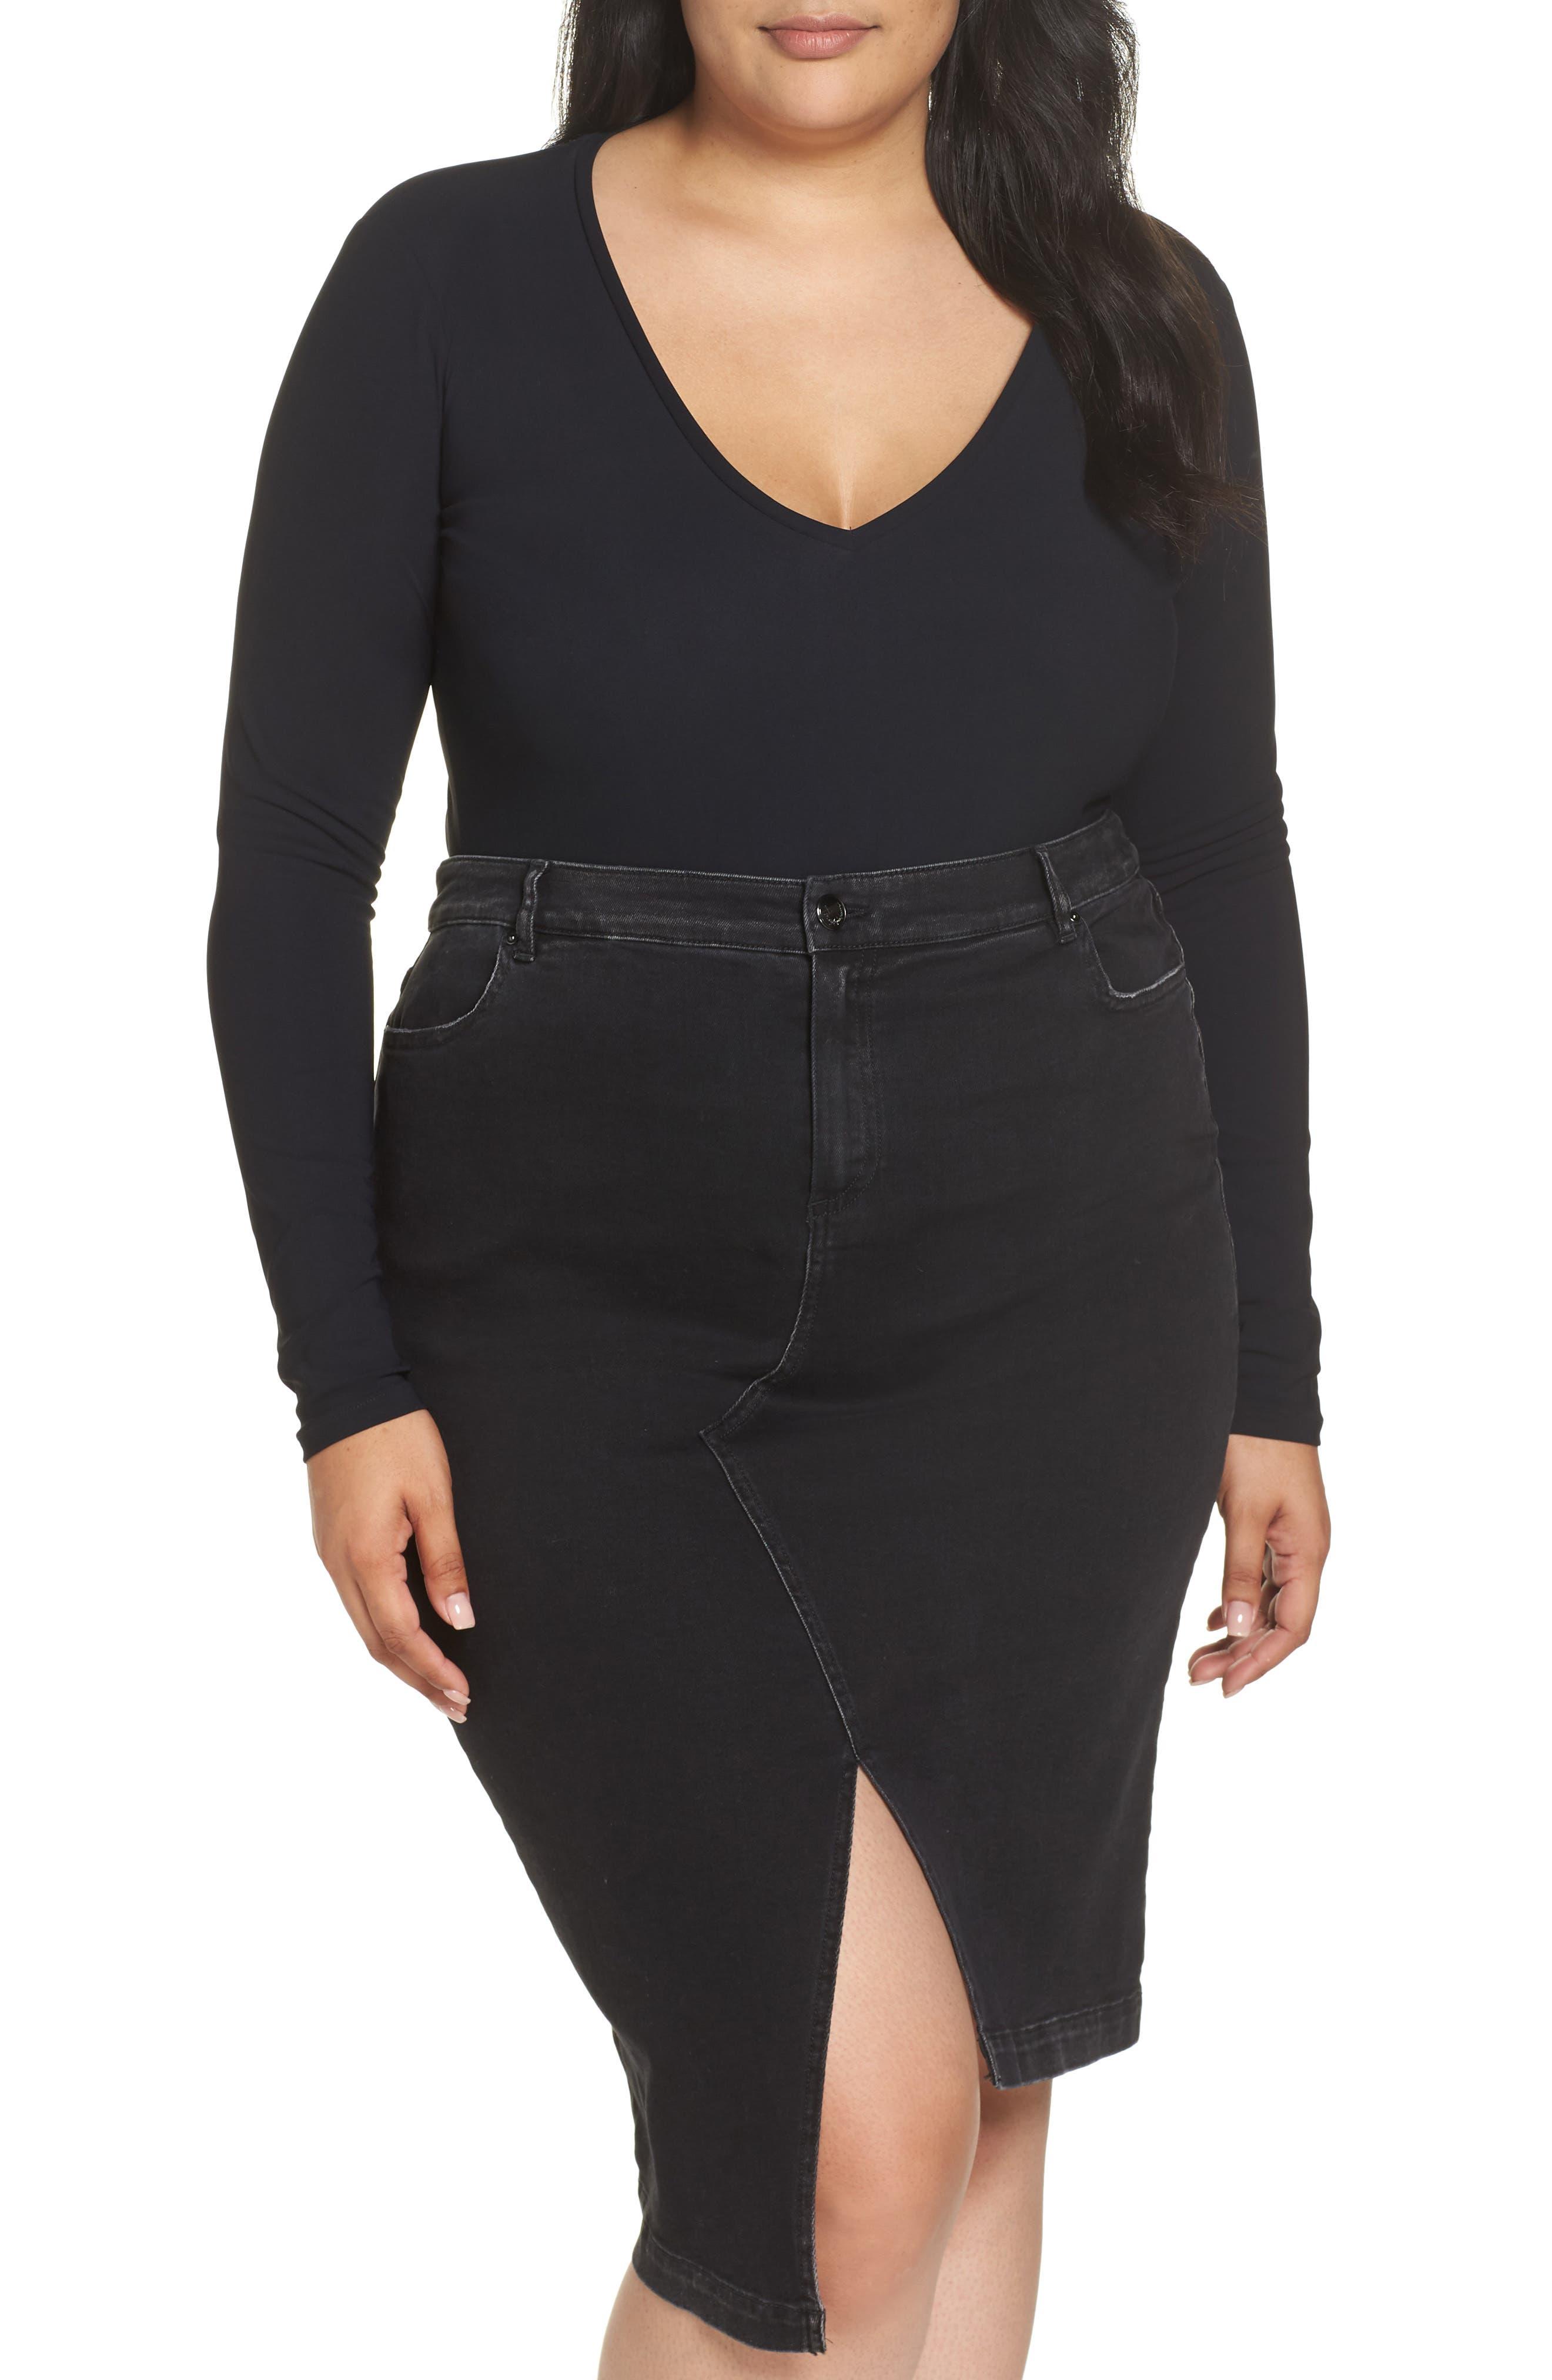 ASHLEY GRAHAM X MARINA RINALDI Zaffera Bodysuit in Black